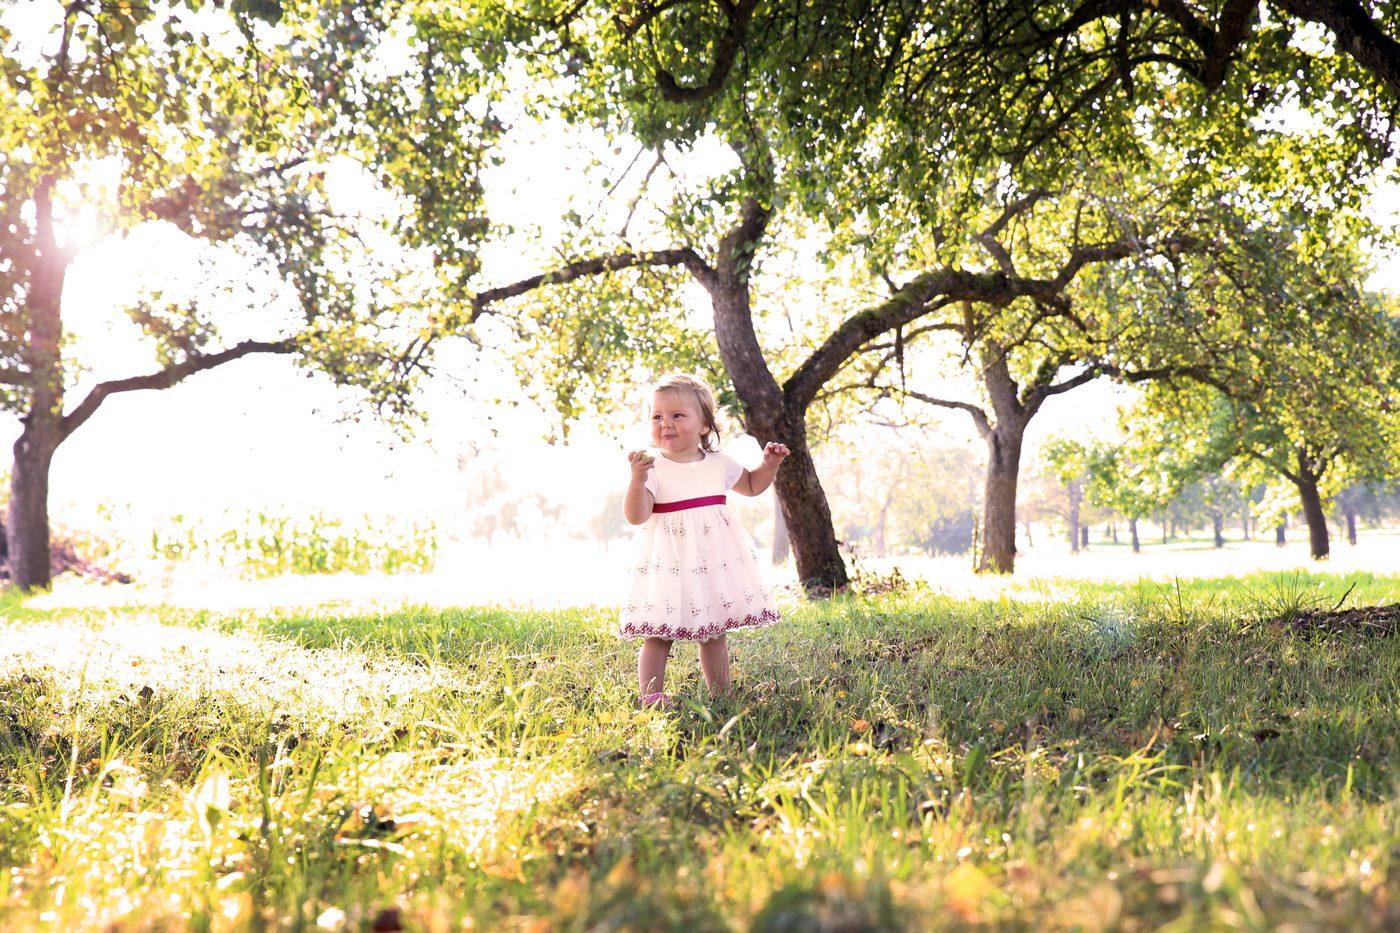 Kleinkind in Obstwiede fotografiert